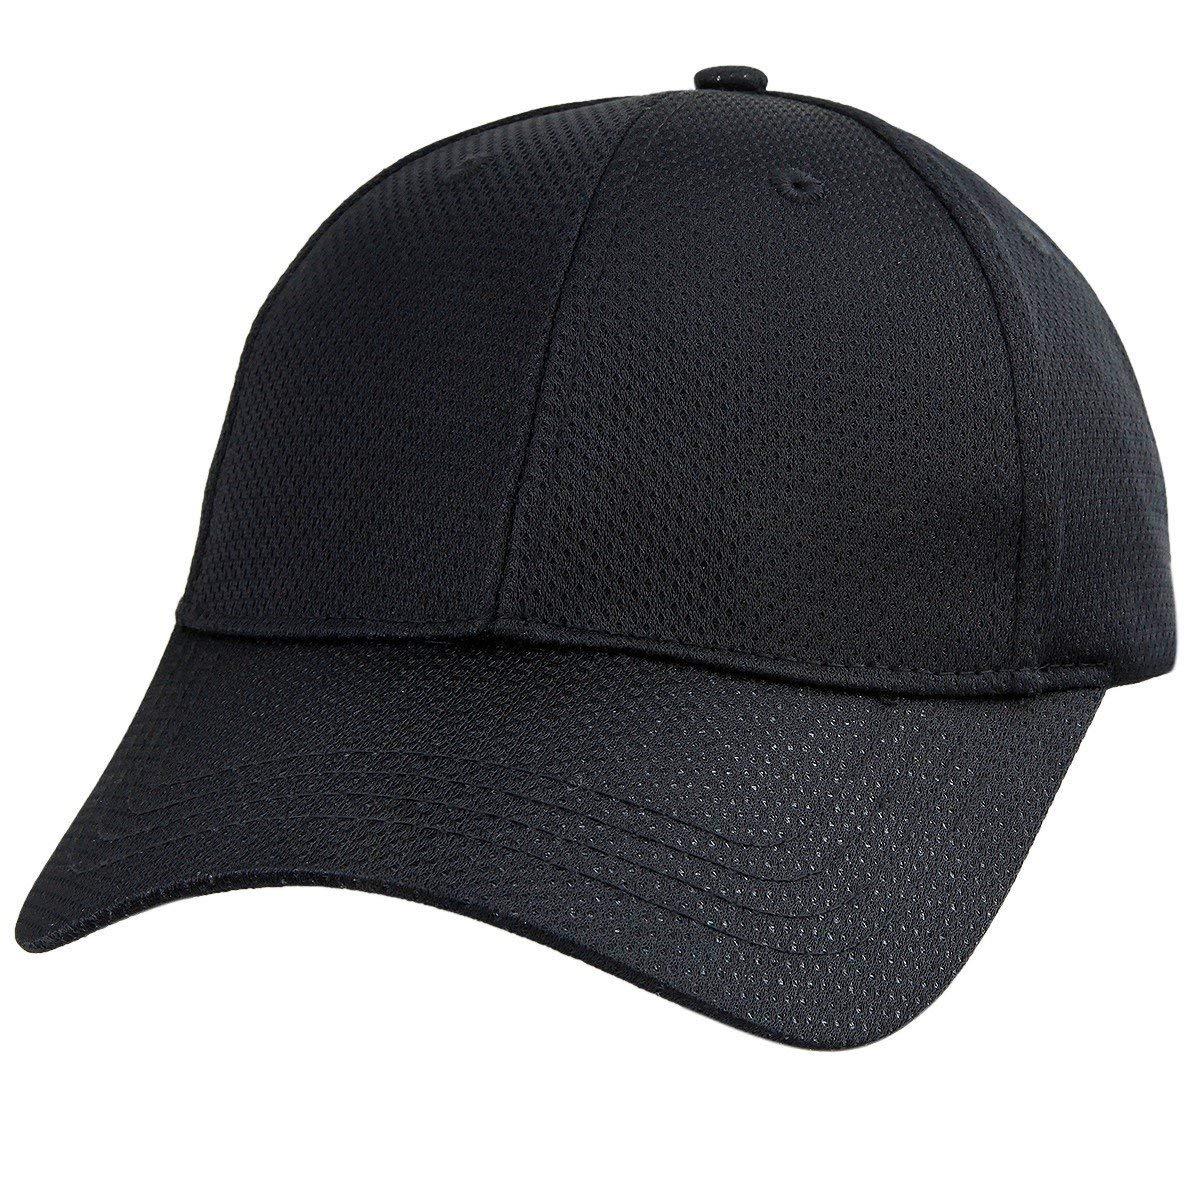 78e1bed26ab Get Quotations · Sportmusies Mesh Baseball Cap Hat